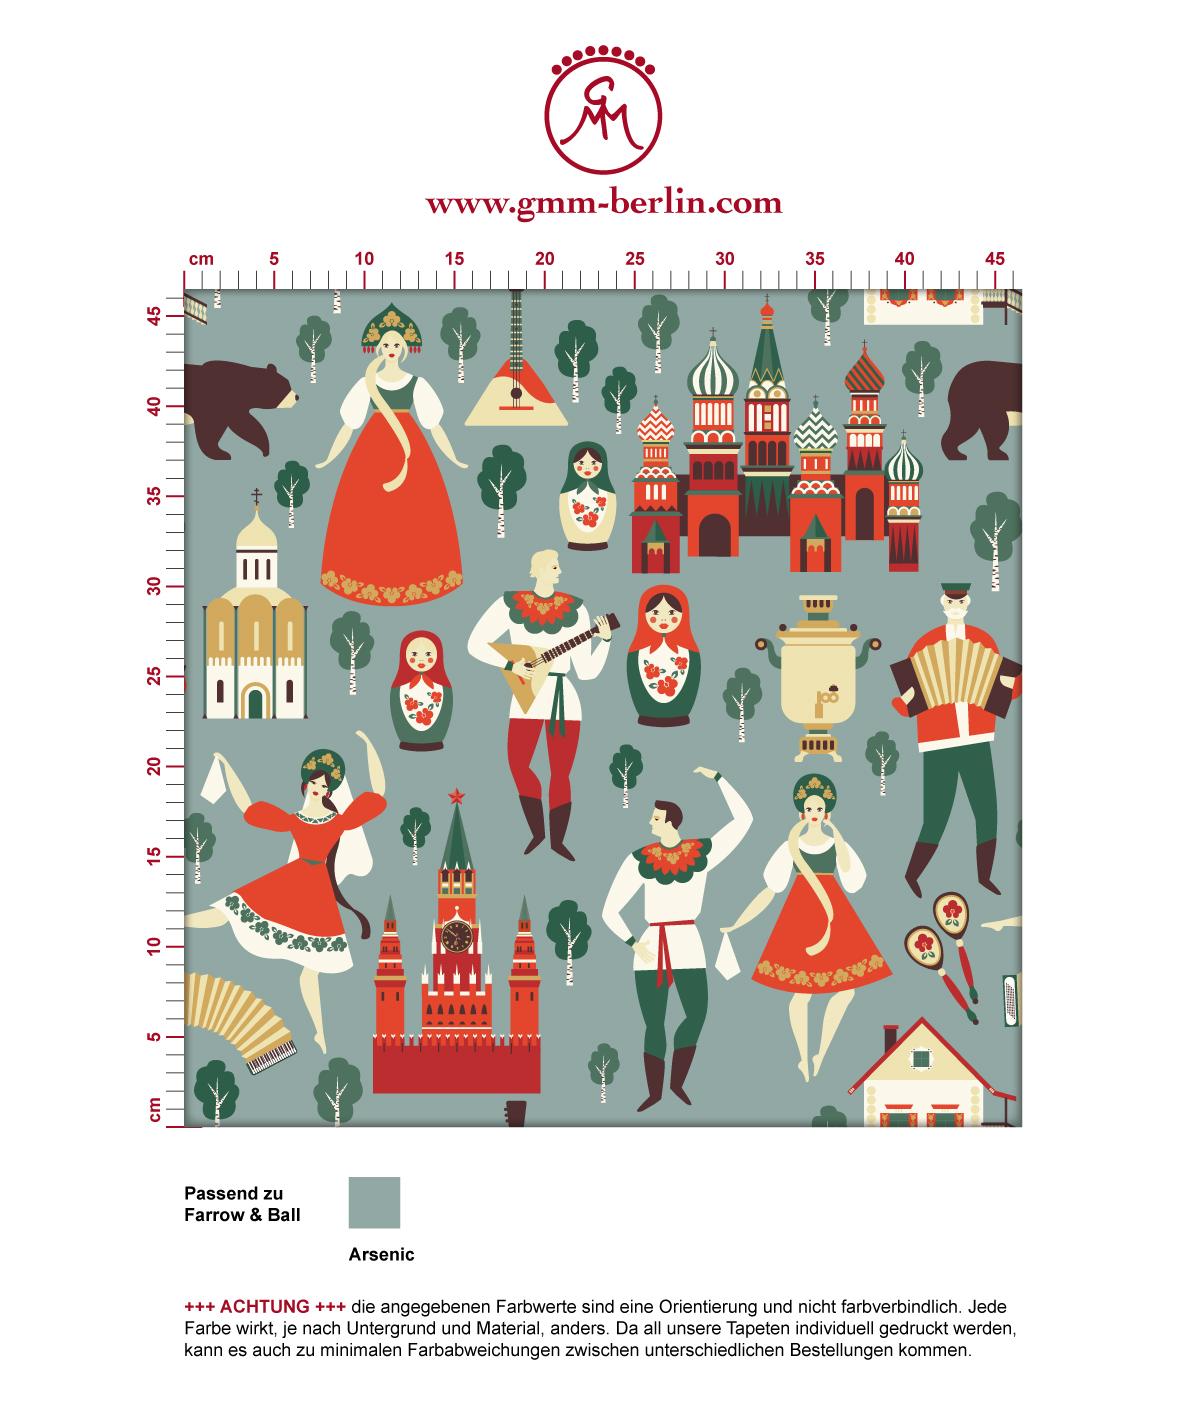 """Kalinka"" bunte Tapete mit tanzenden Russen in Tracht, Bären und russischen Elementen in grau grün - groß angepasst an Farrow & Ball Wandfarben"